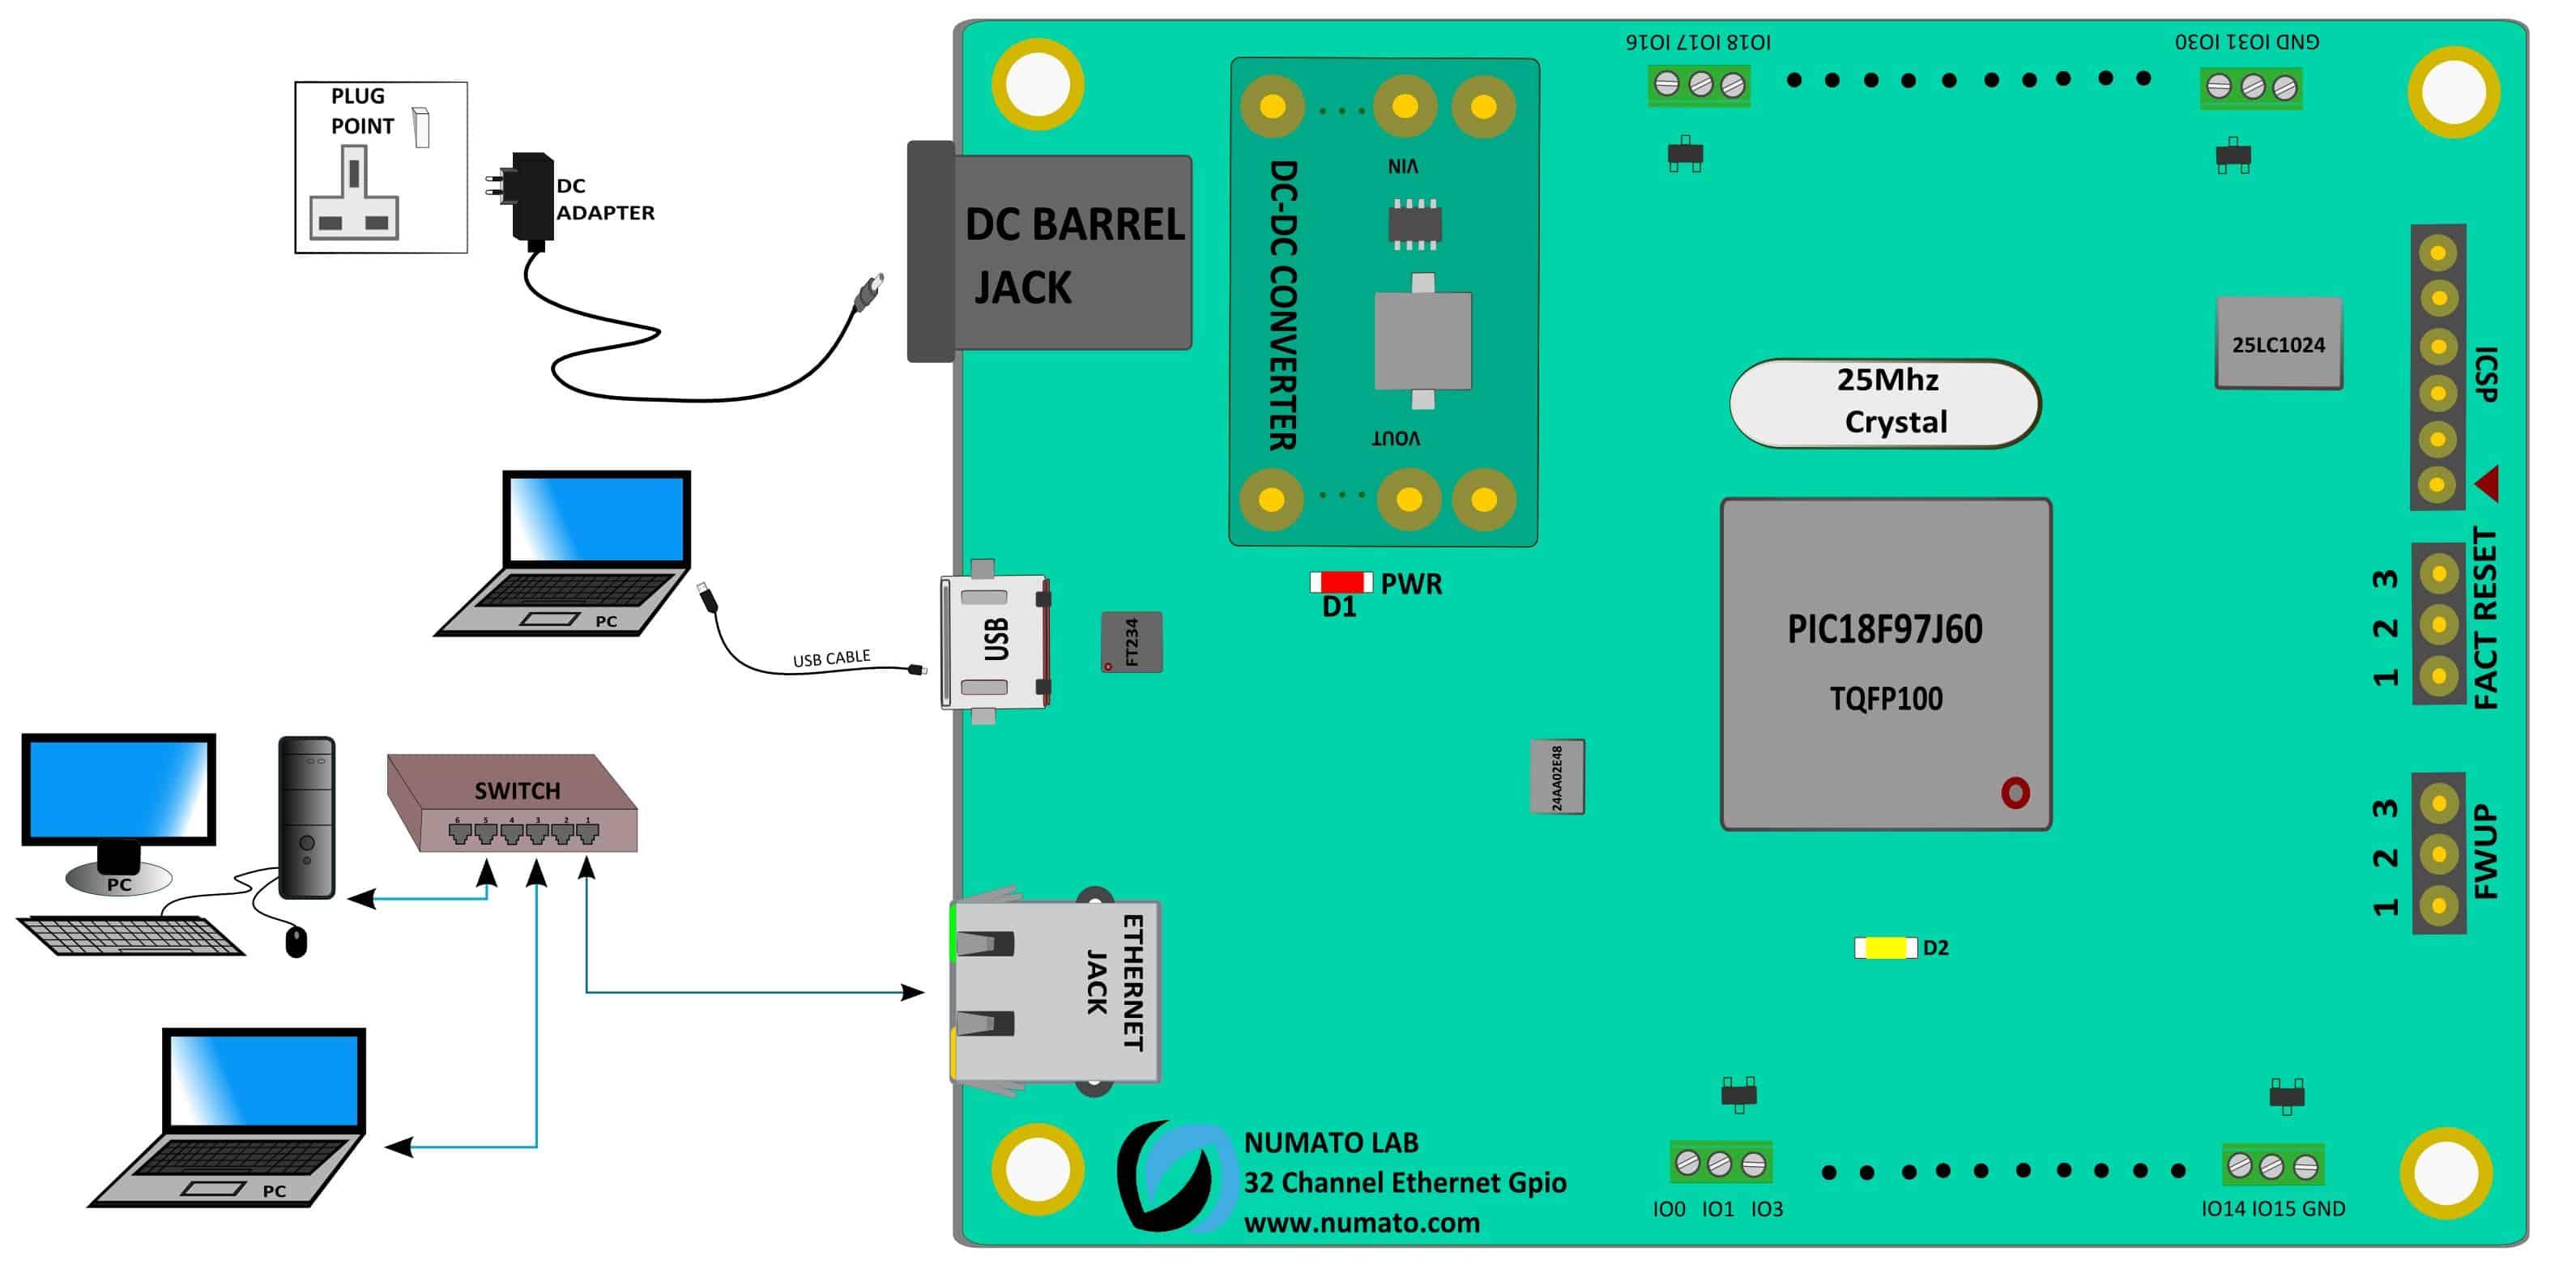 32 Channel Ethernet GPIO Module With Analog Inputs – Numato Lab Help ...